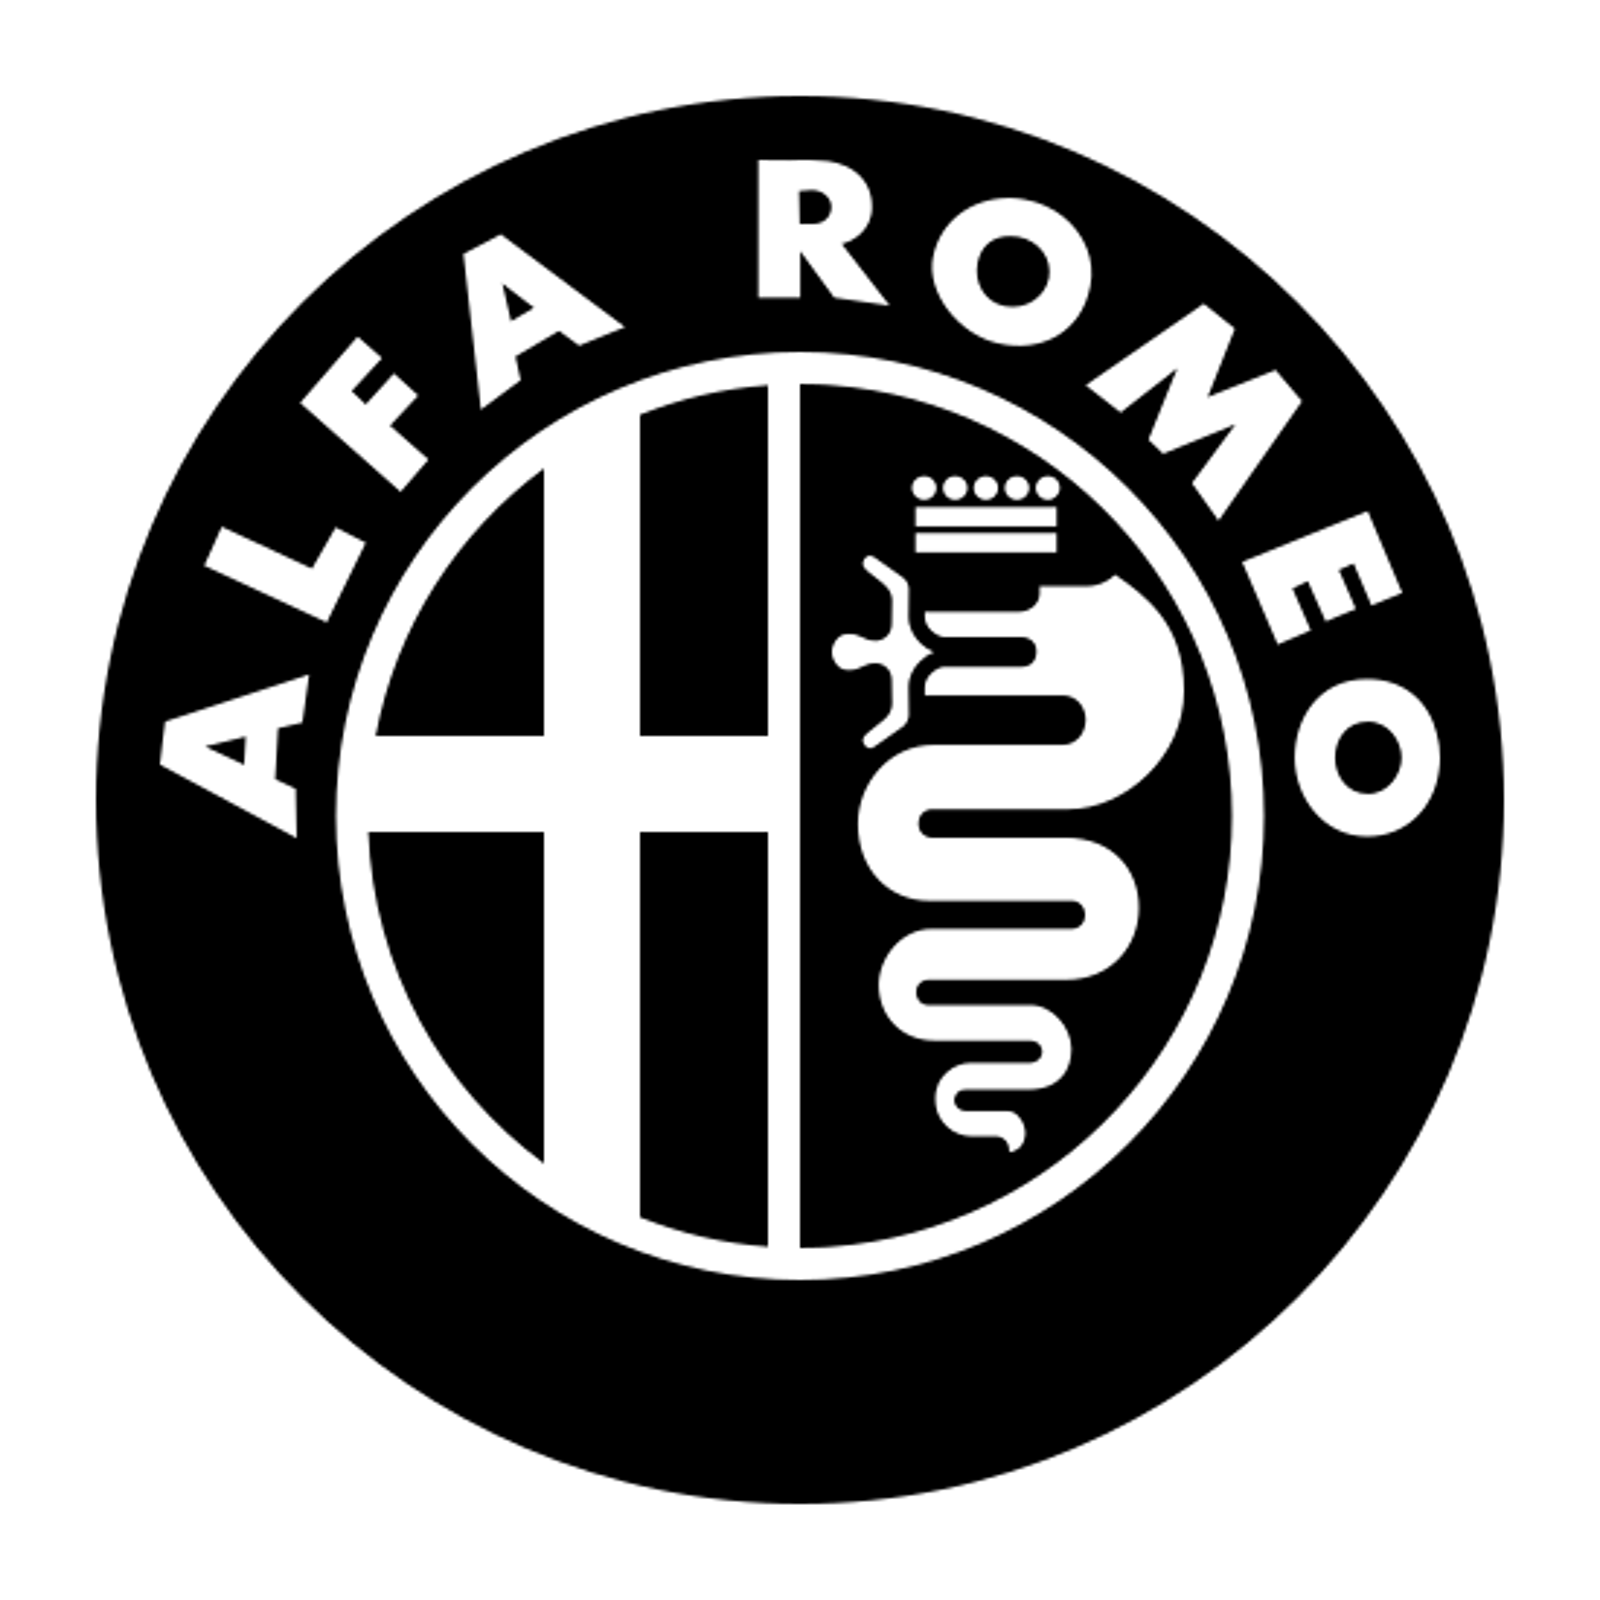 Alfa Romeo Filled icon